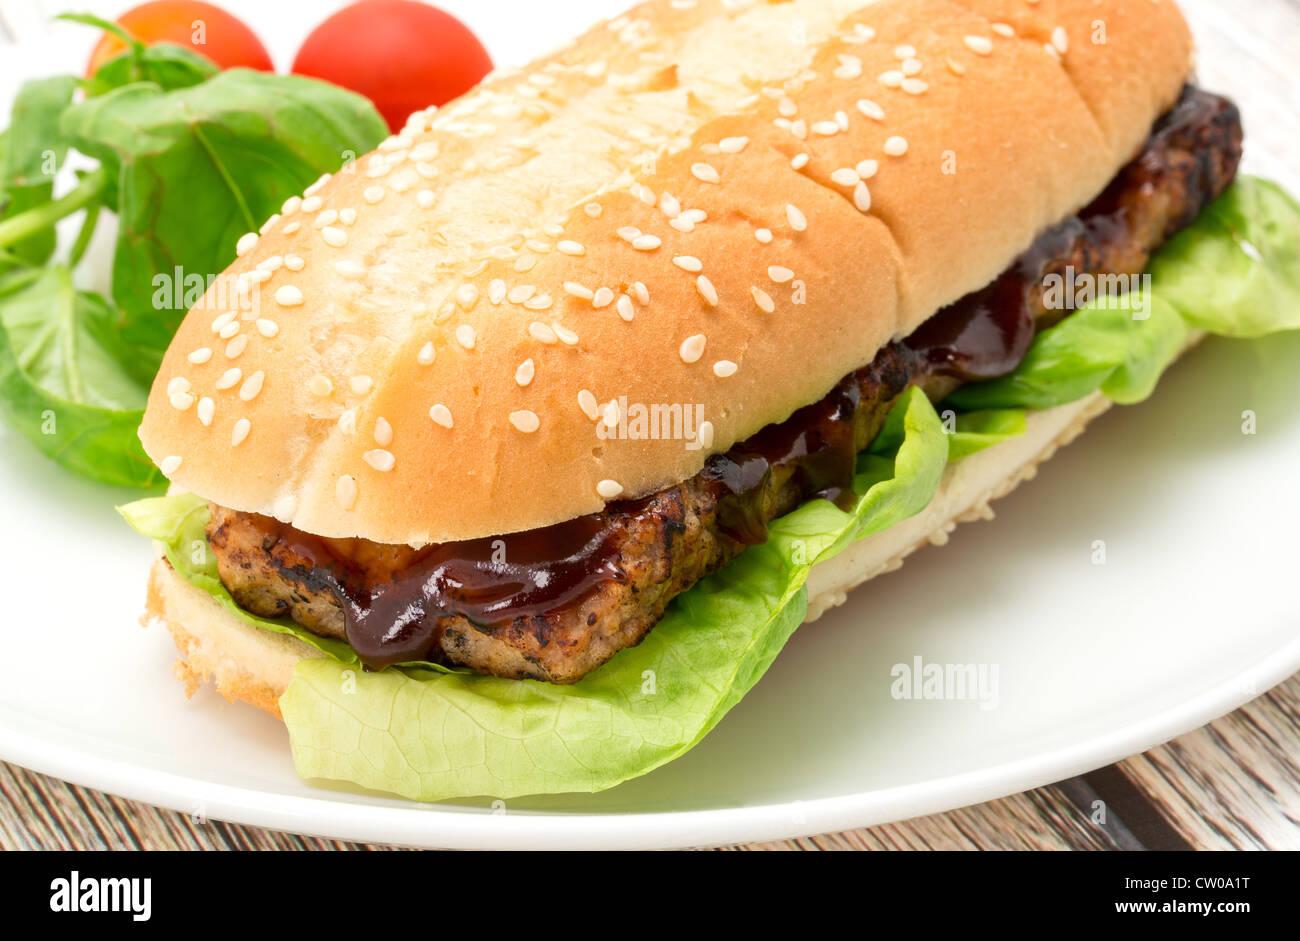 BBQ spare rib burger sandwich close-up - studio shot - Stock Image